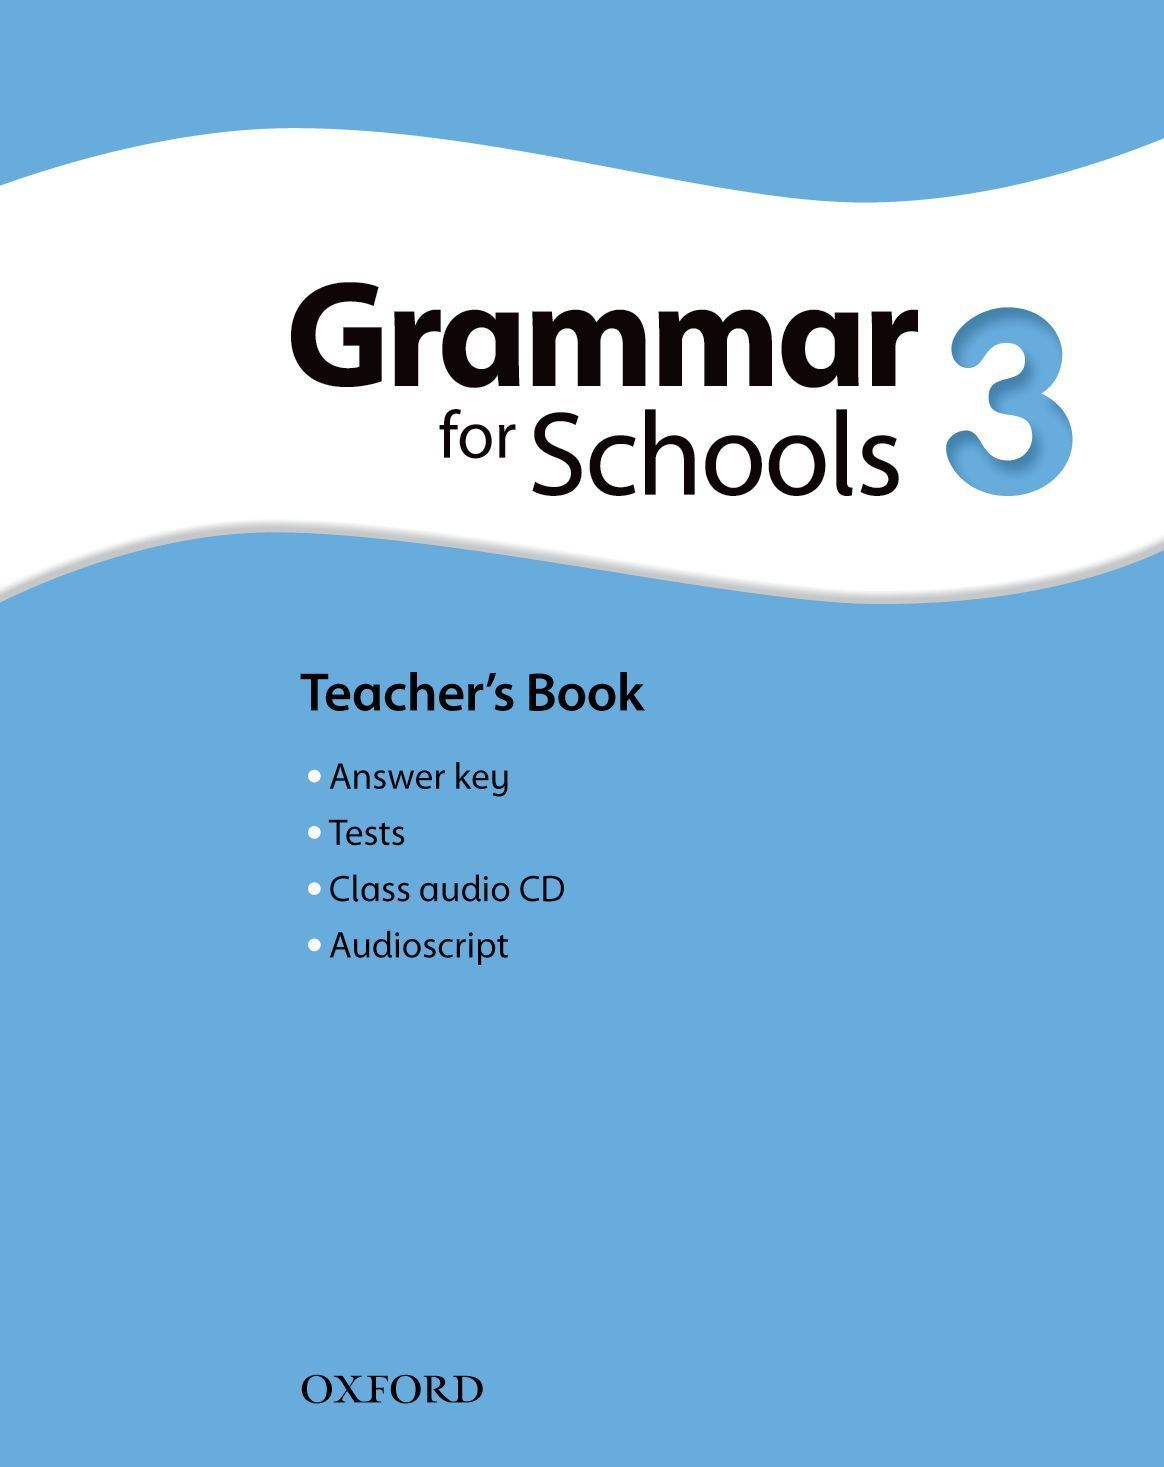 Oxford Grammar for Schools 3 Teacher's book & Audio - 1